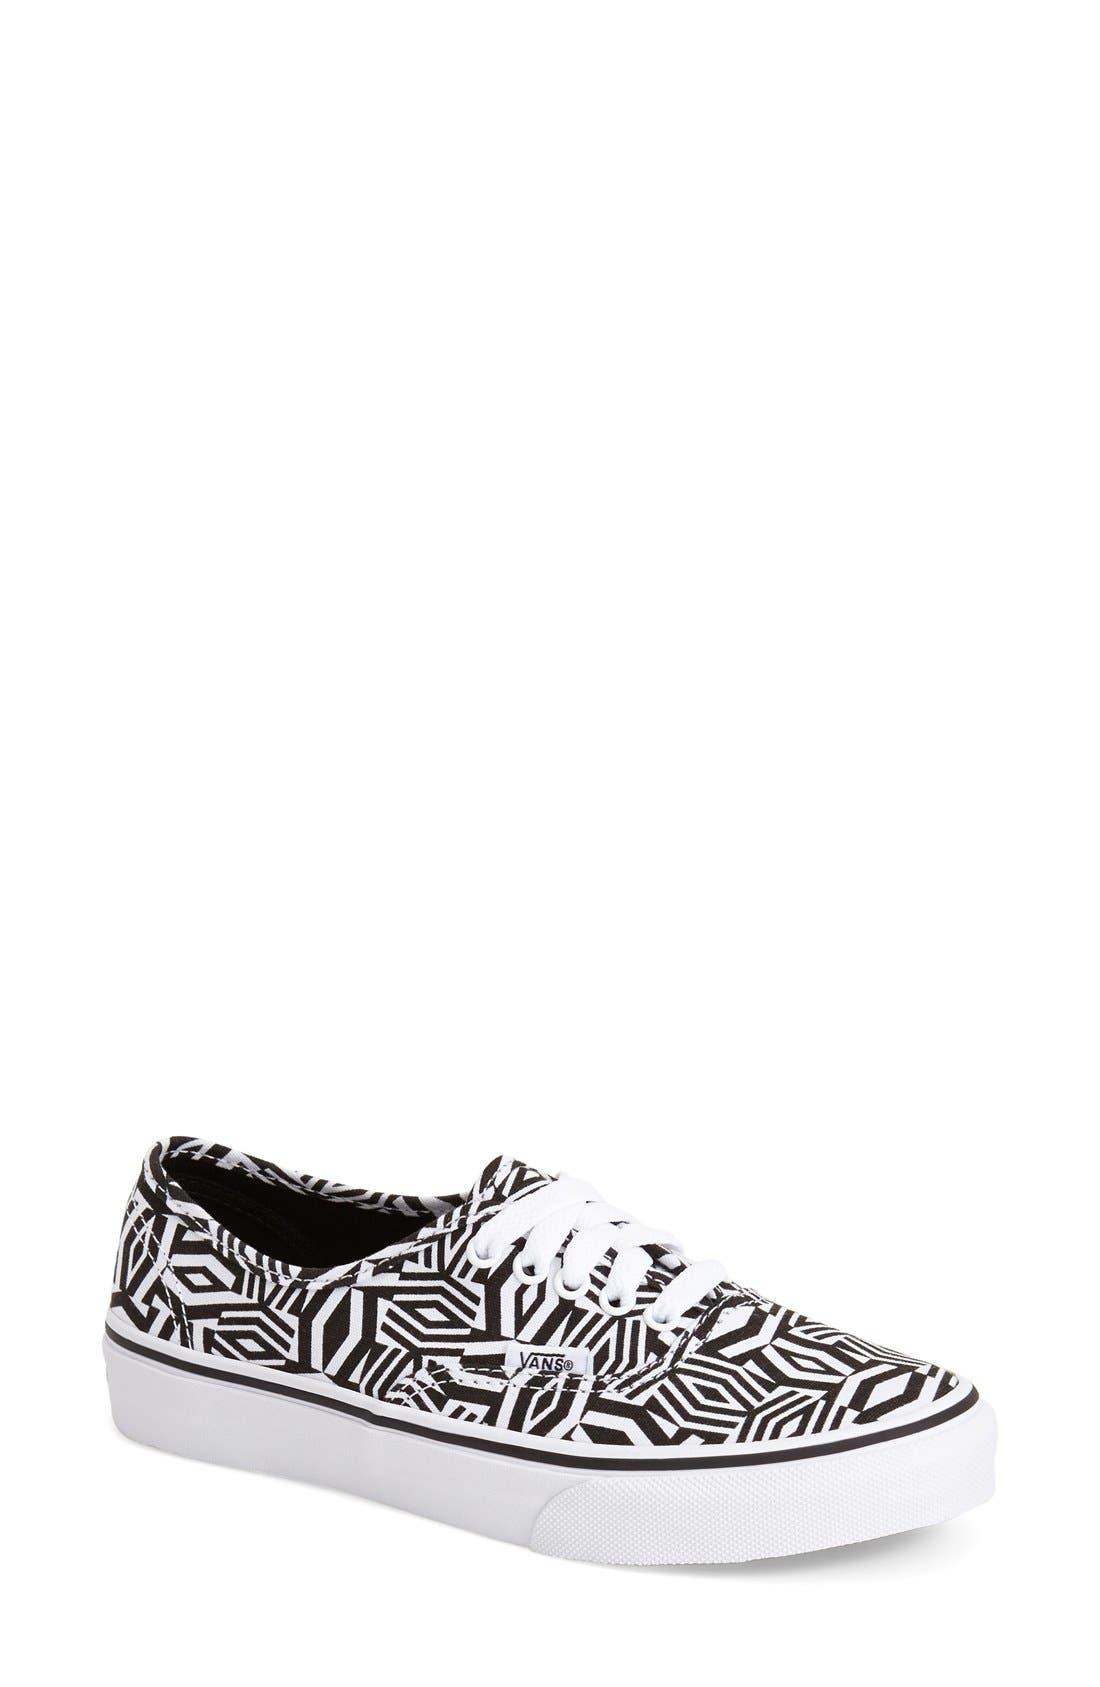 Alternate Image 1 Selected - Vans 'Authentic Slim - Geo Realm' Sneaker (Women)